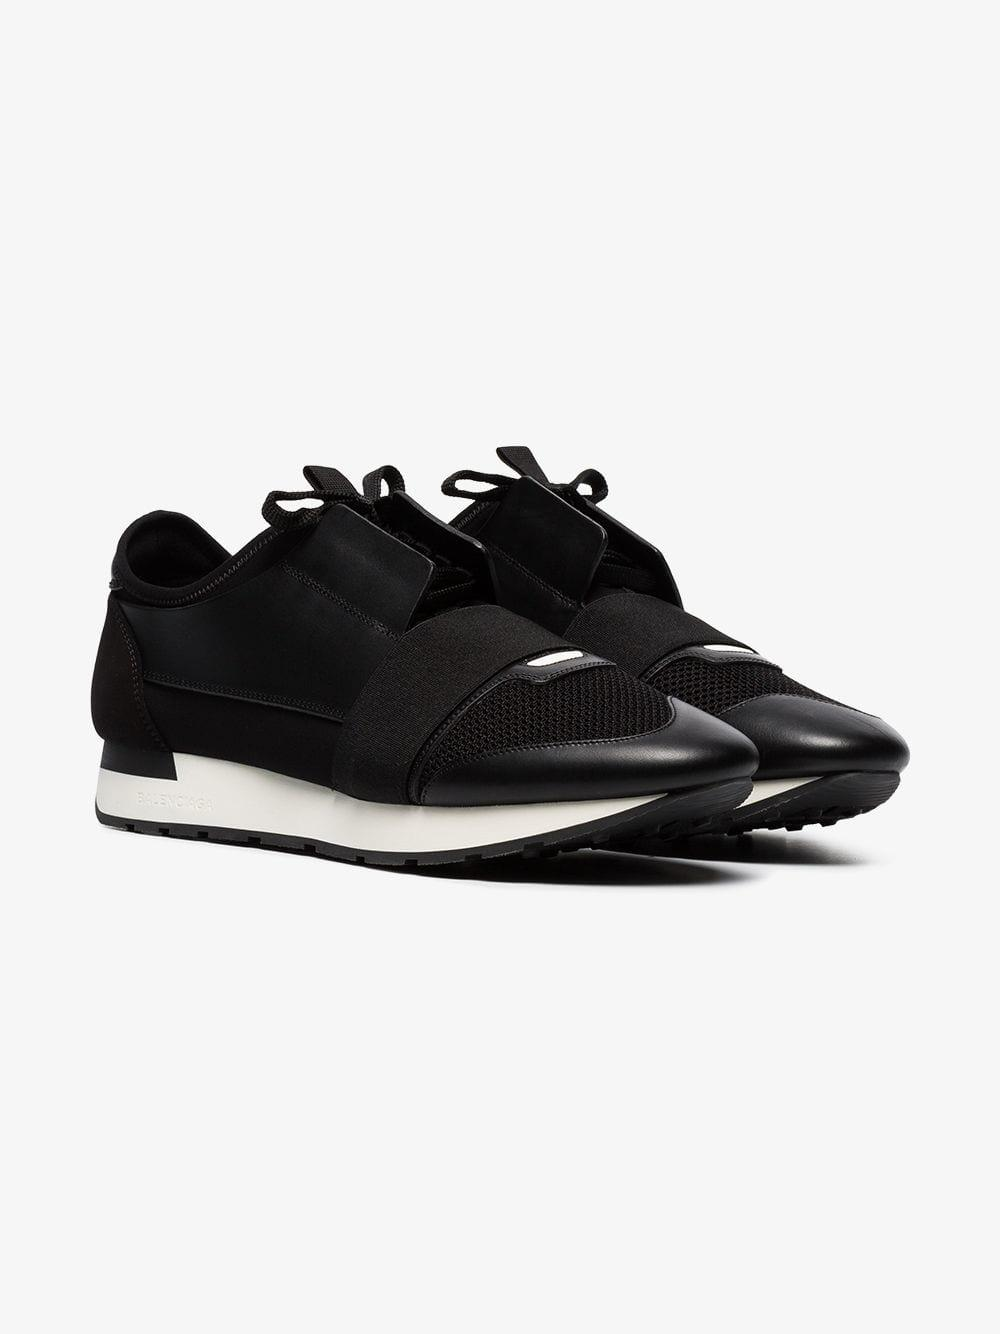 5e473abff167 Lyst - Balenciaga Black Race Runner Leather Sneakers in Black for Men